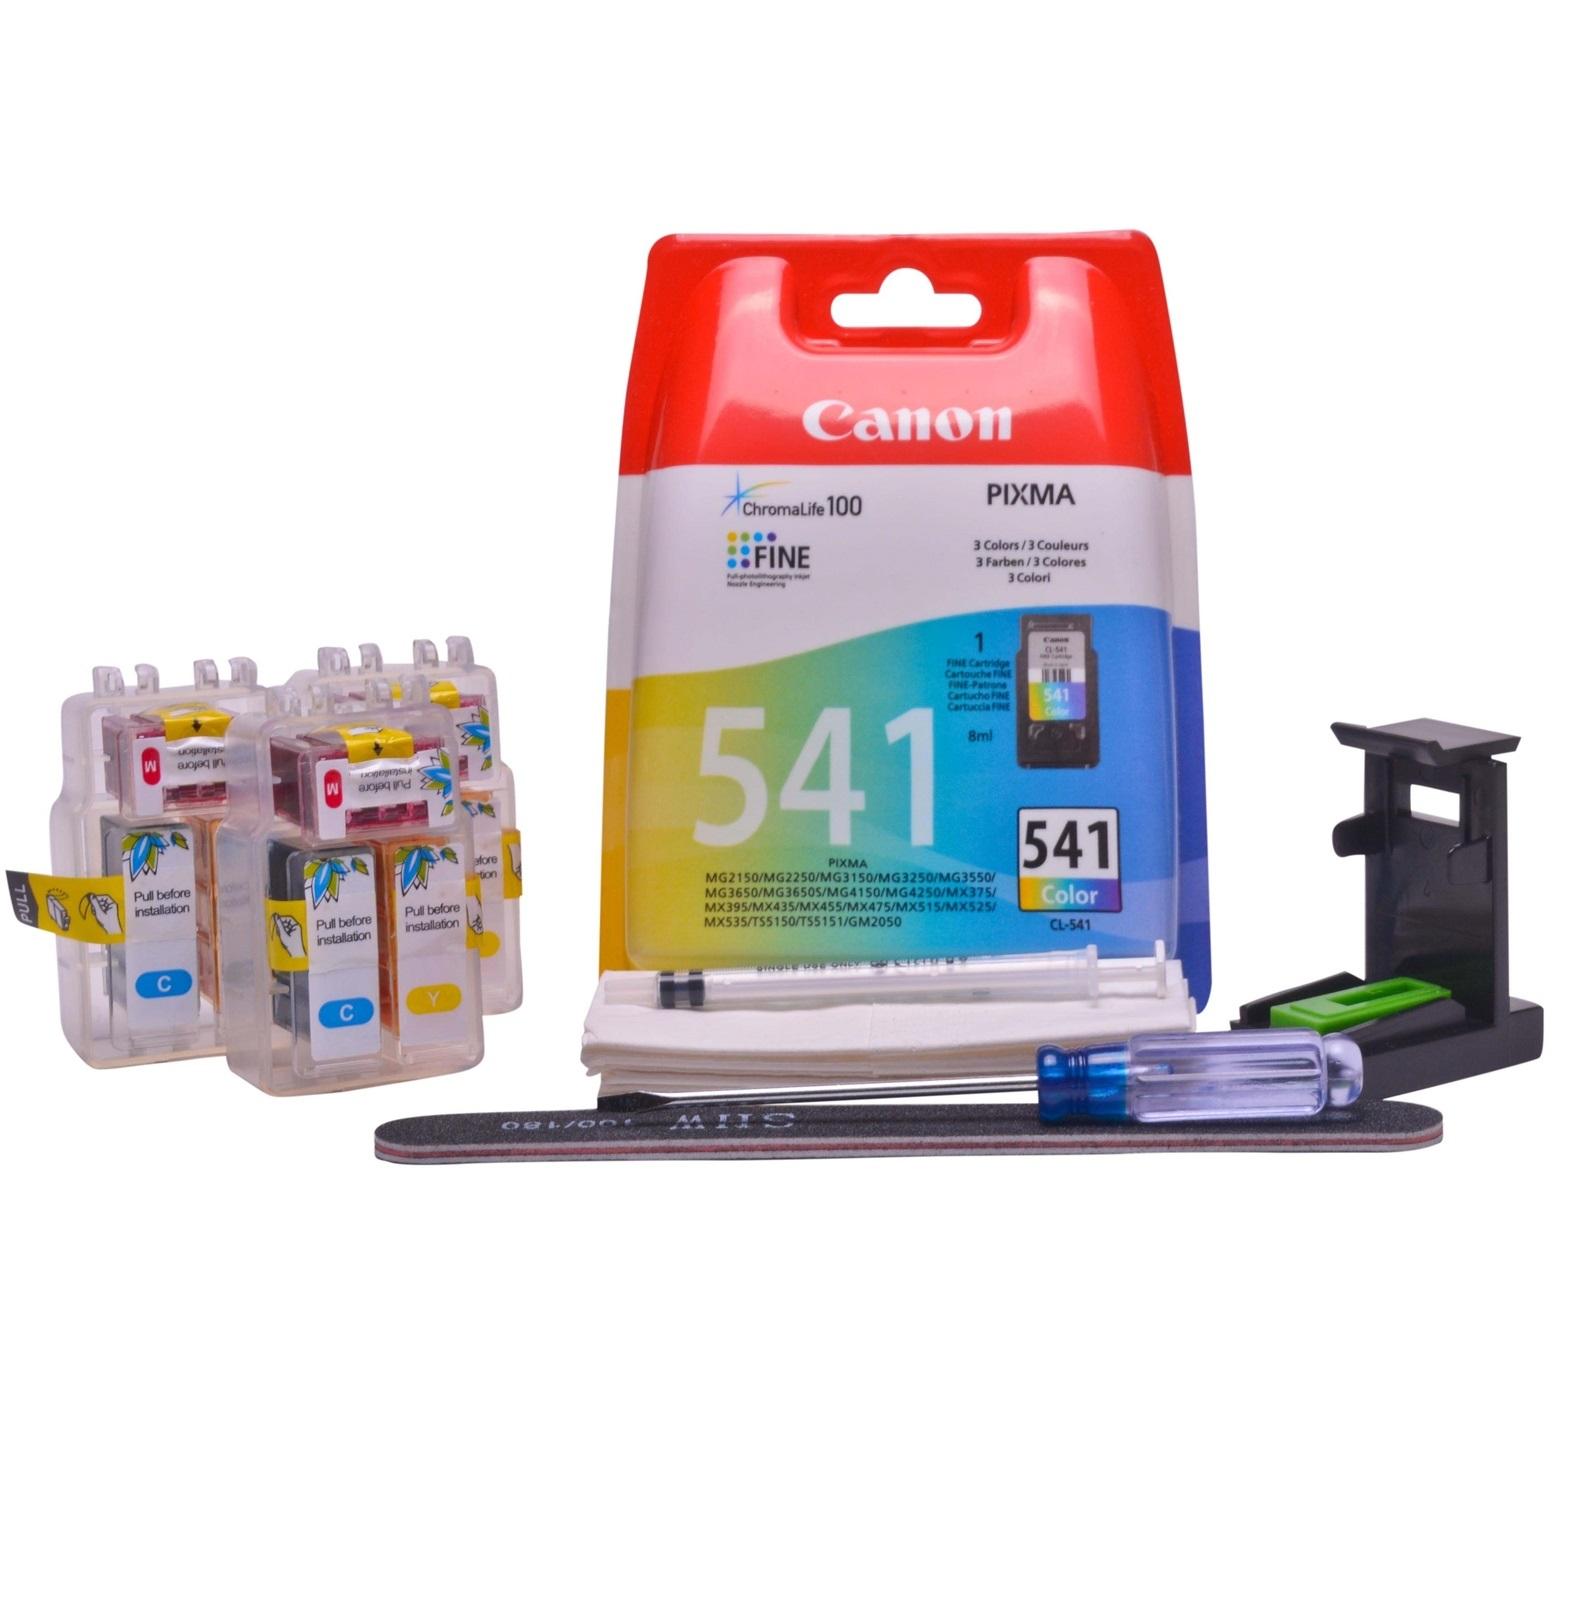 Refillable CL-541XL Colour Pod Cheap printer cartridges for Canon Pixma MG3600 CL-541 dye ink